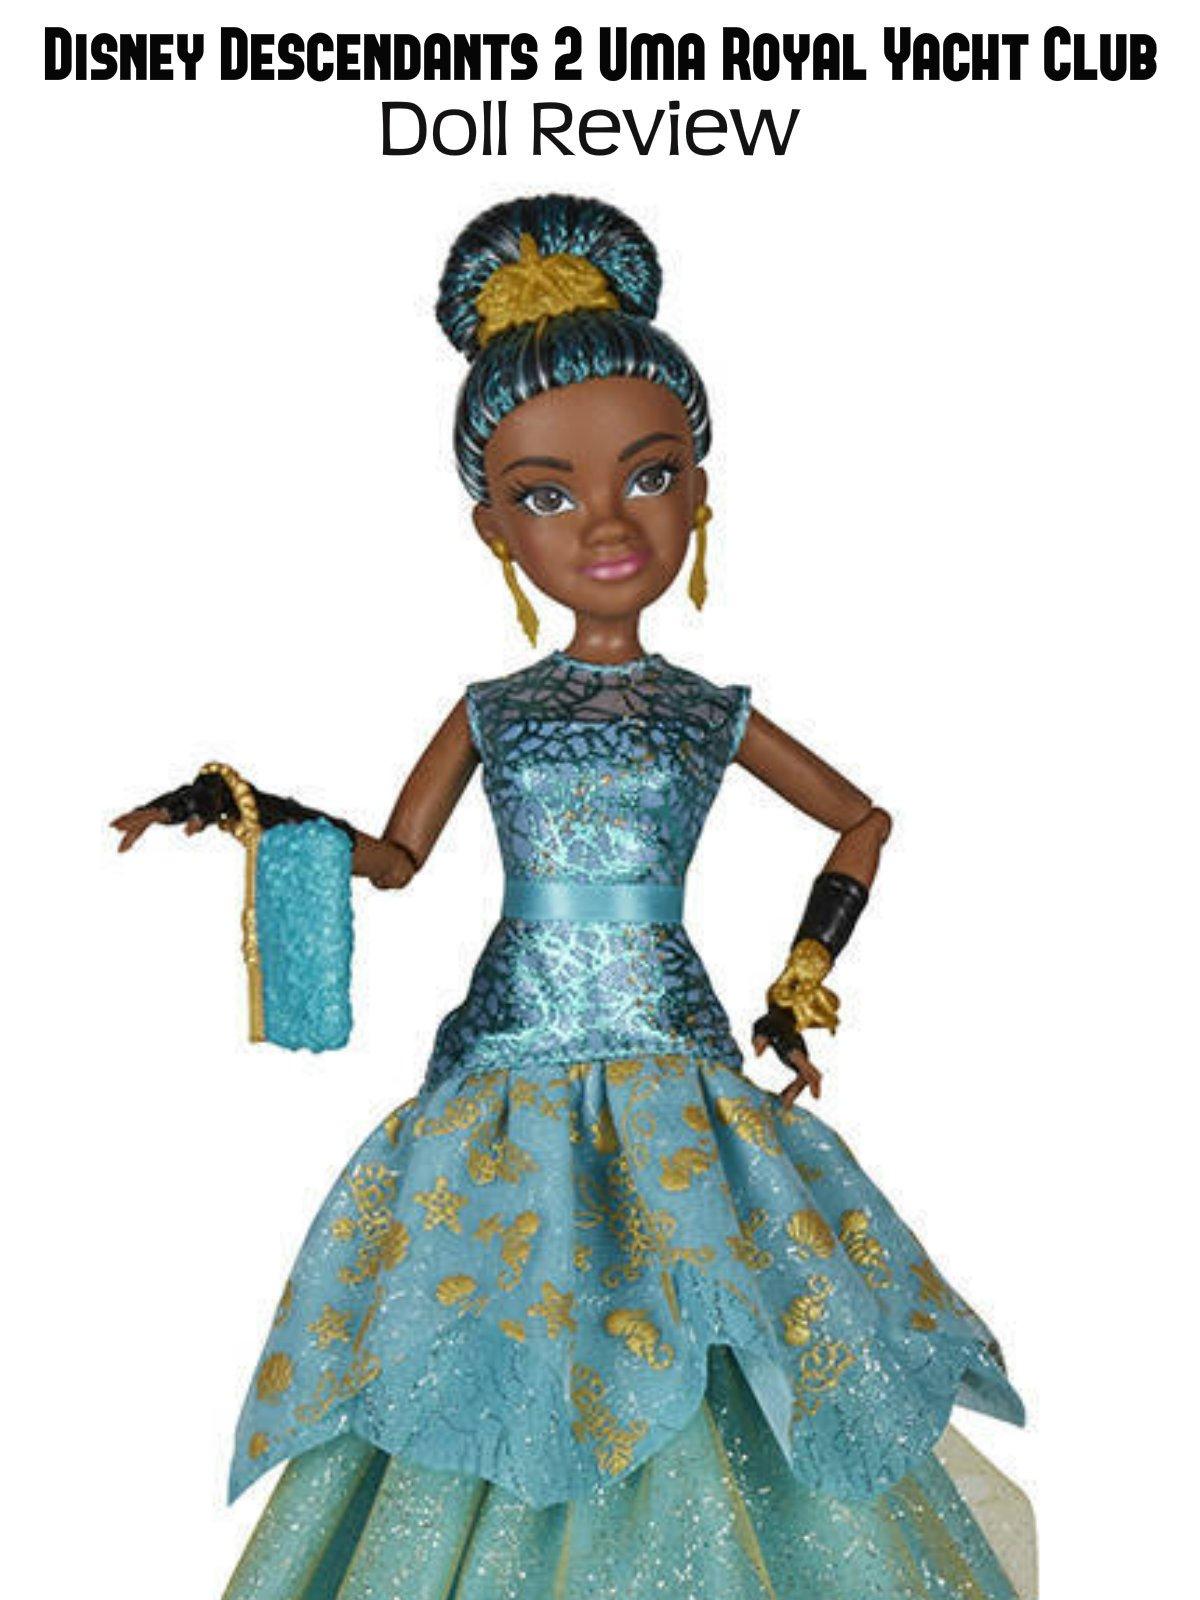 Review: Disney Decendants 2 Uma Royal Yacht Club Doll Review on Amazon Prime Video UK